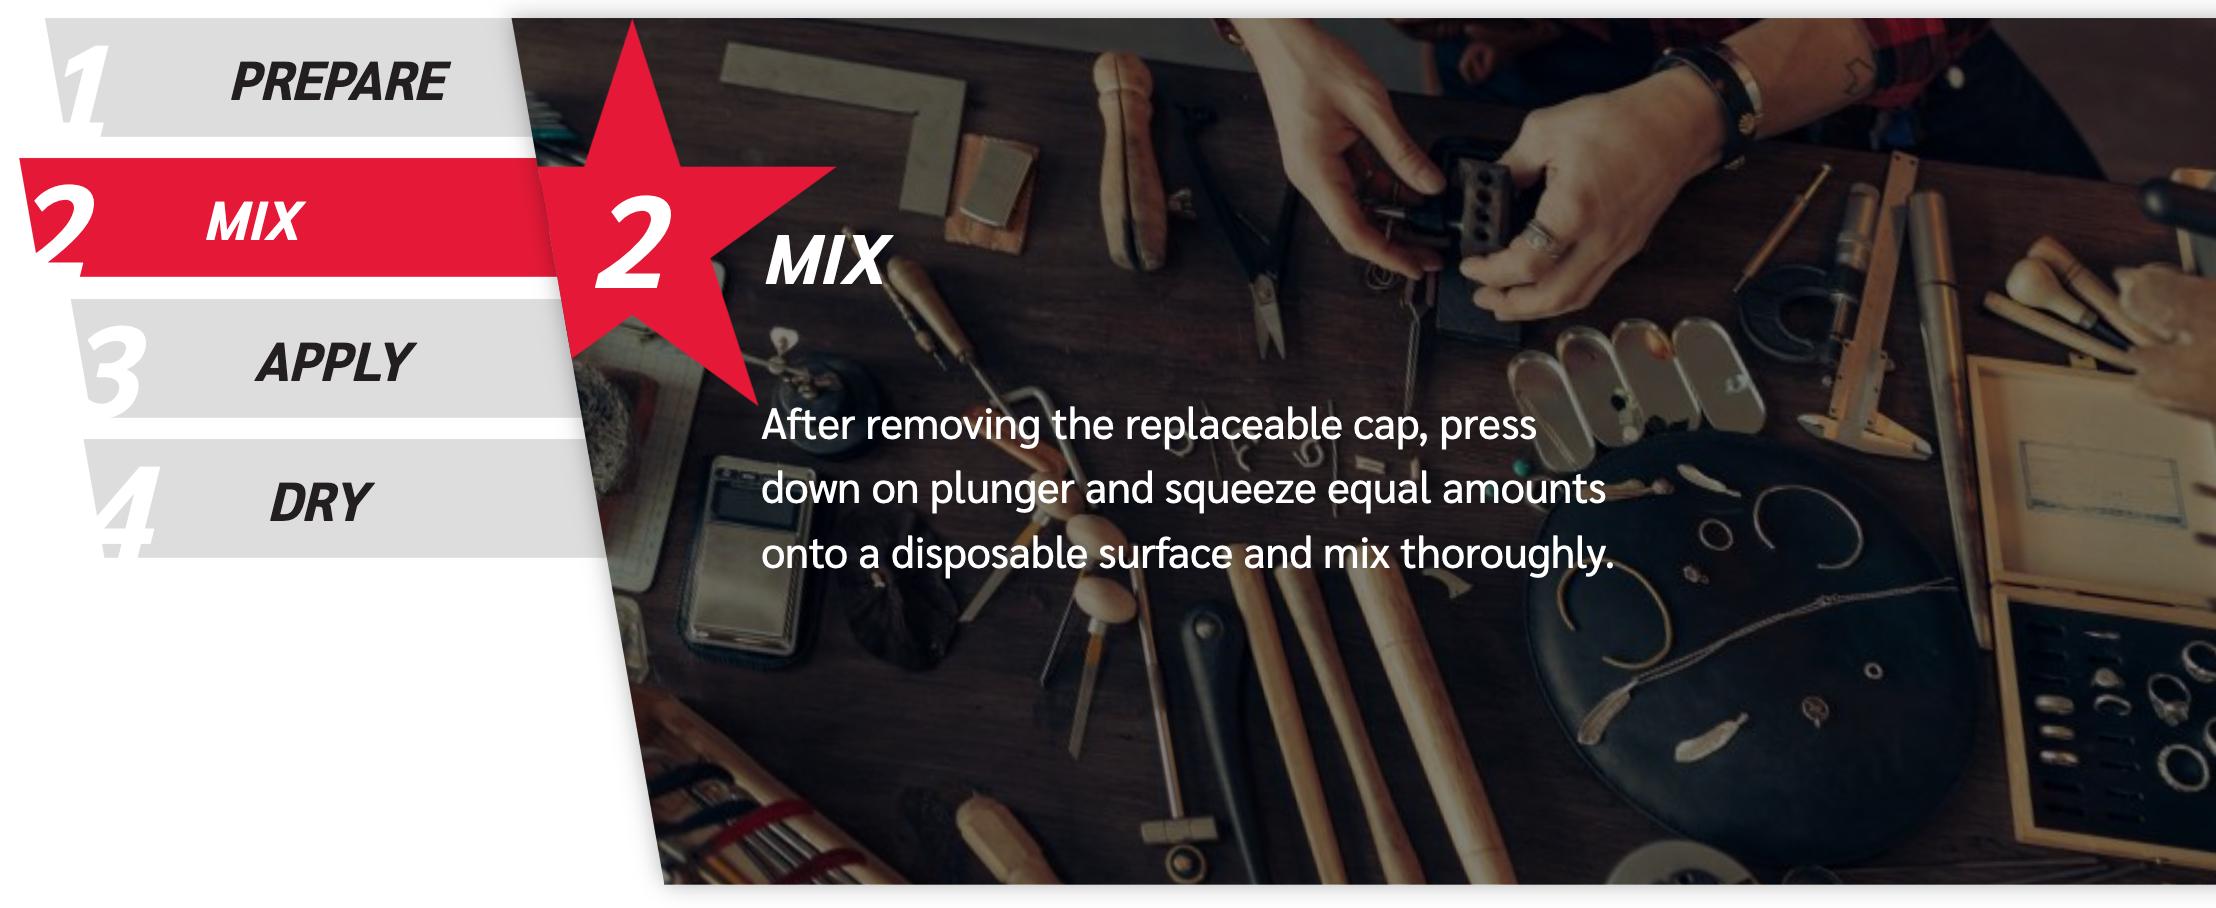 50176uk-mix-fixthebog.uk.png